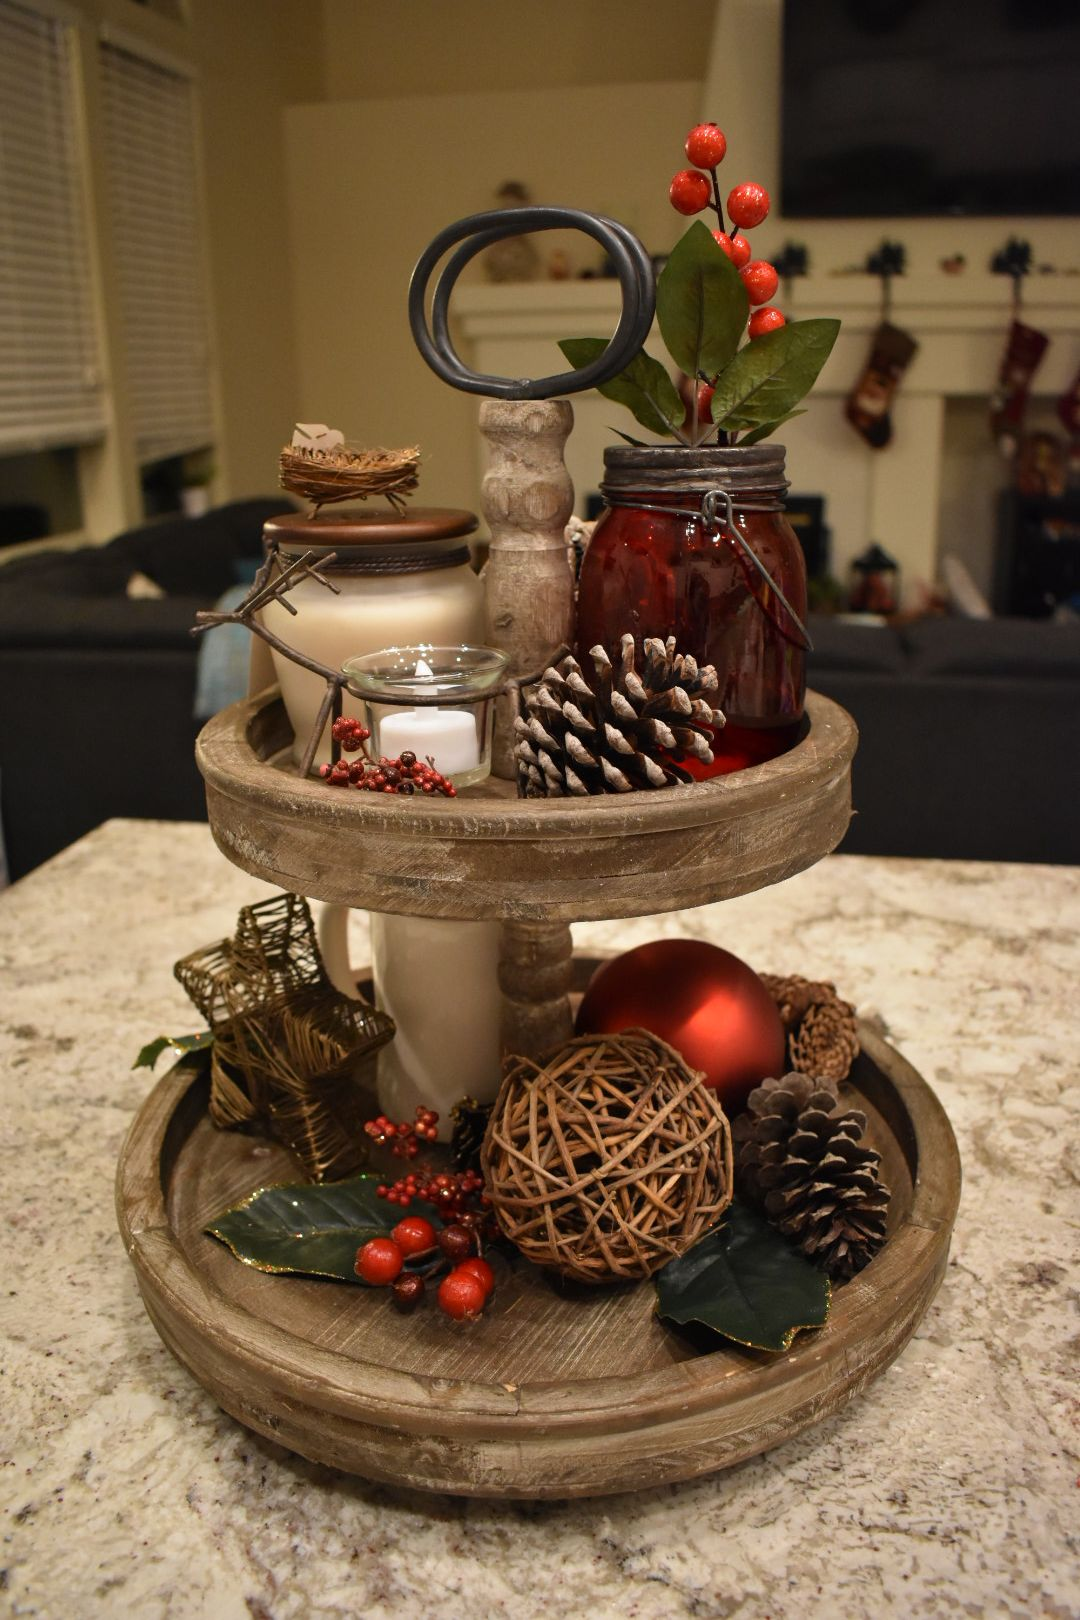 Pin By Kim Pyle On Stuff That Tray Decor Christmas Christmas Tray Tiered Tray Decor